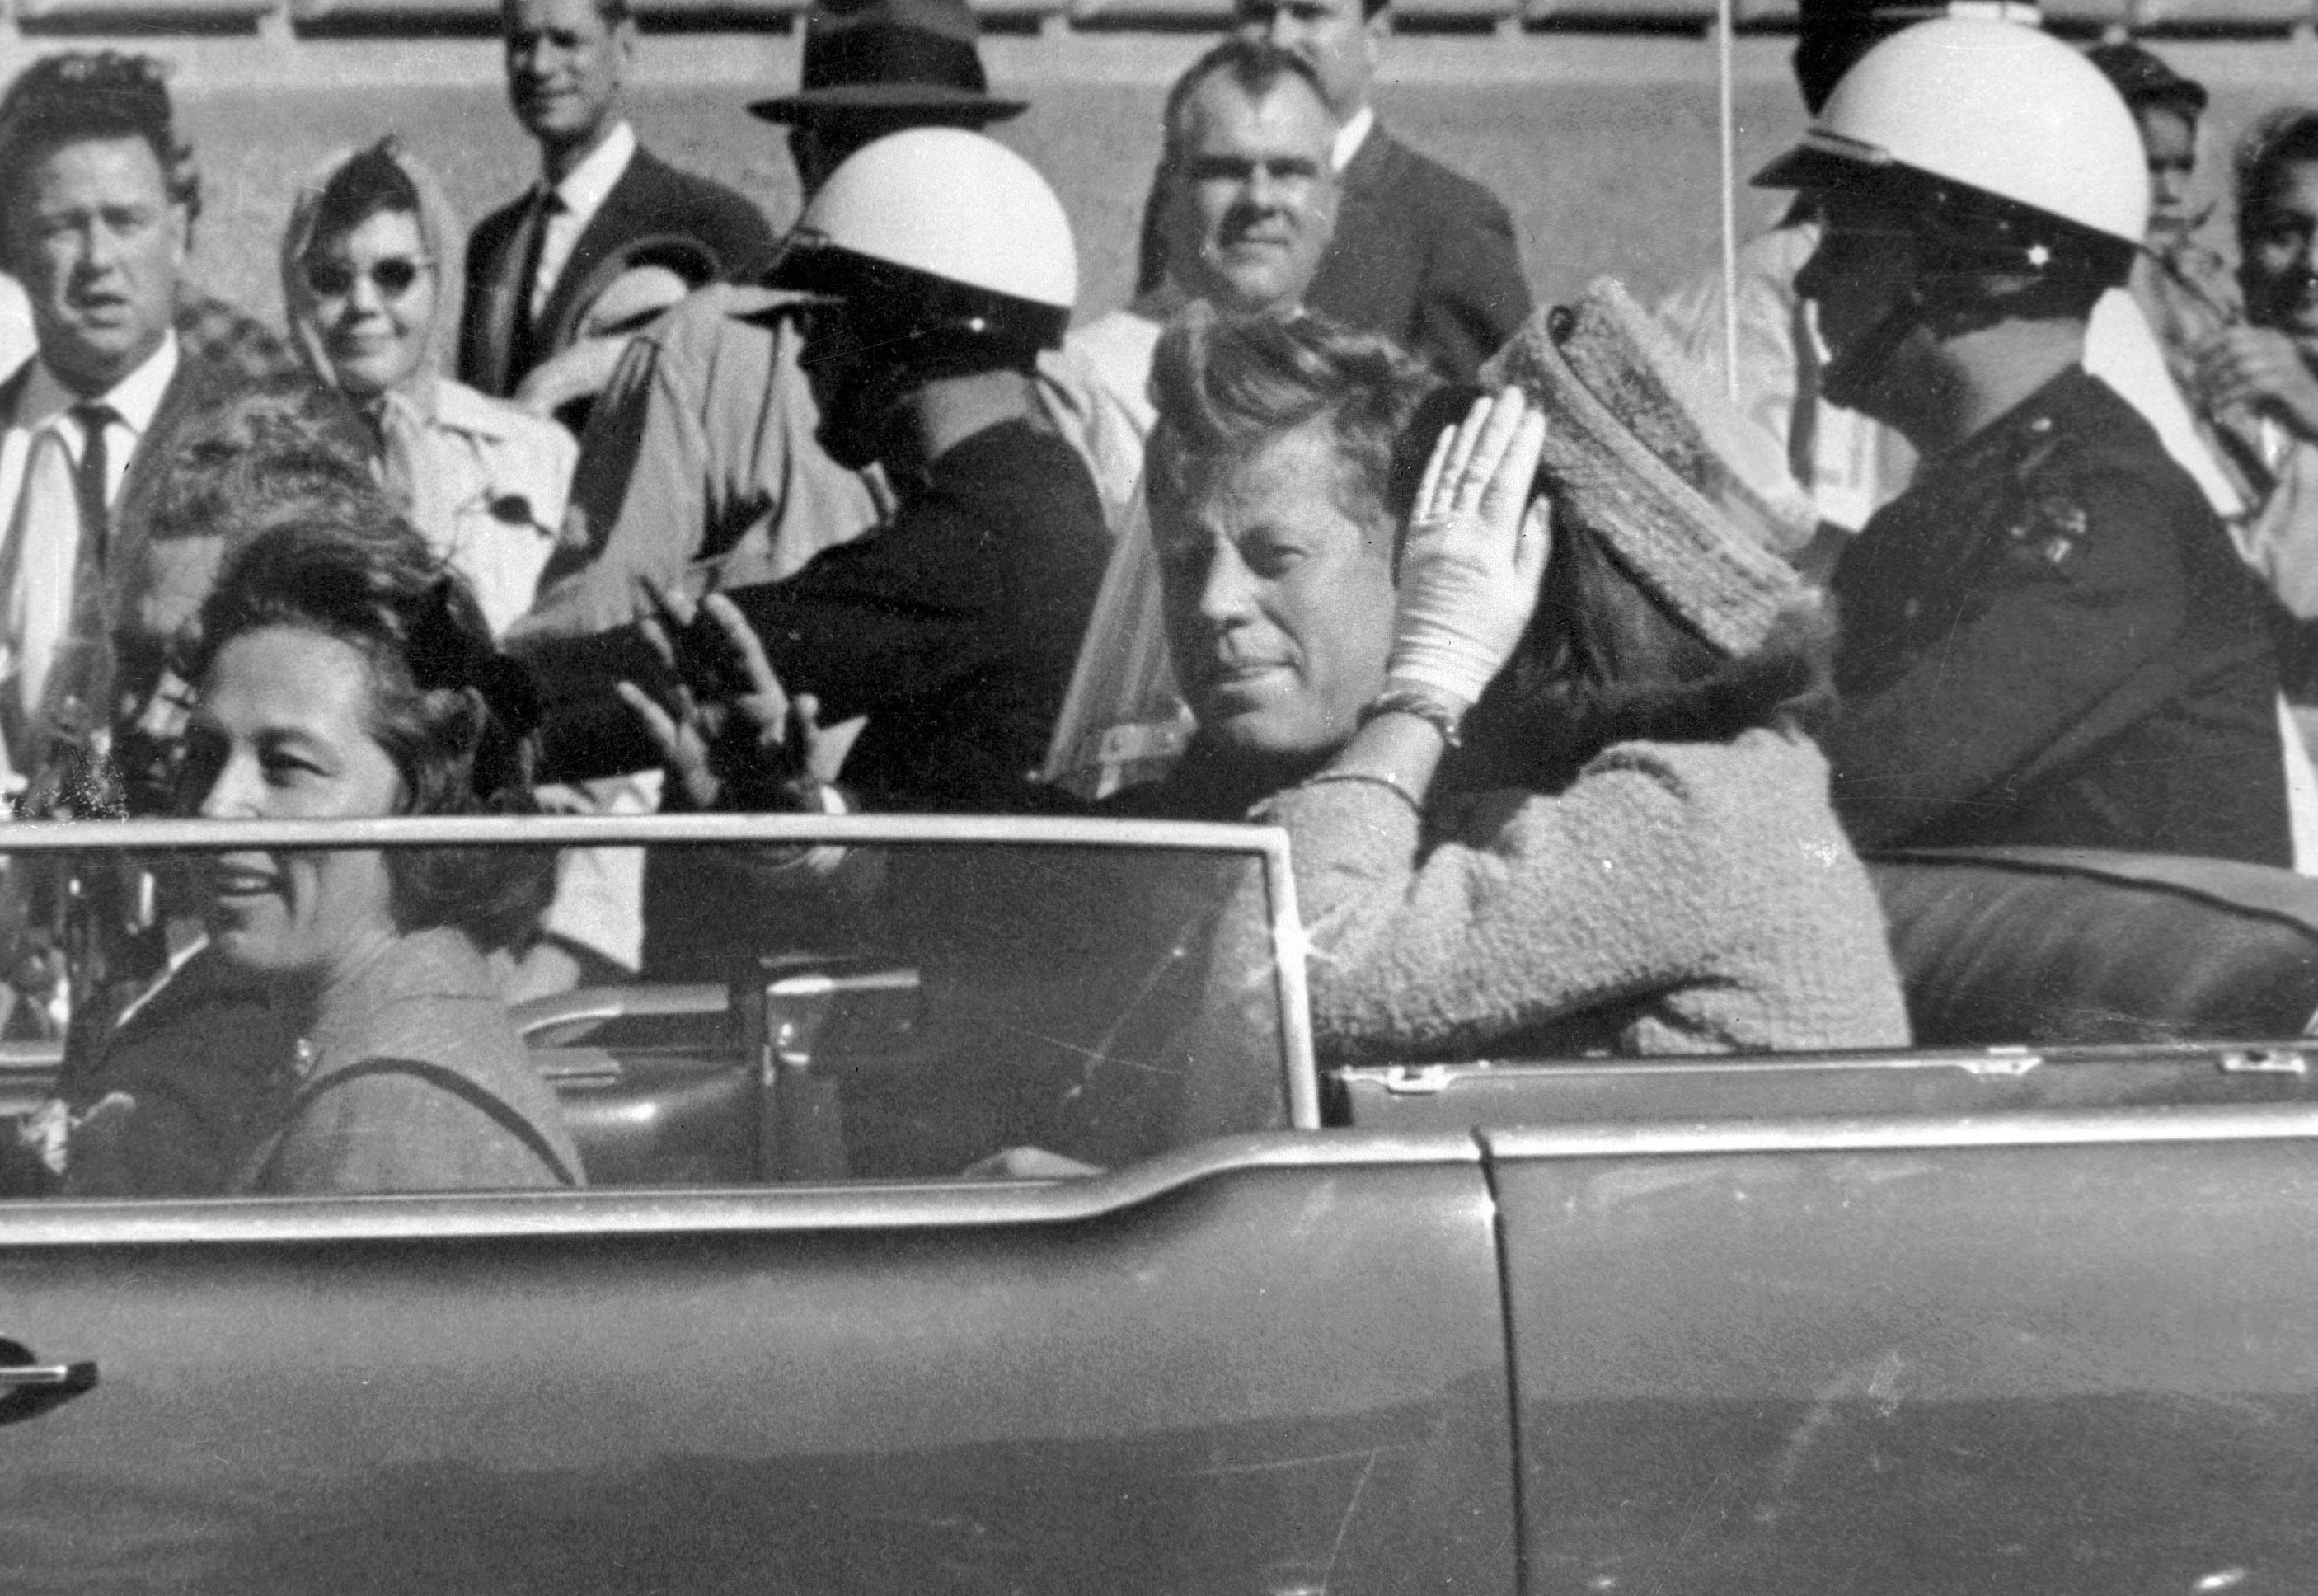 Donald Trump says he won't block release of secret JFK assassination files